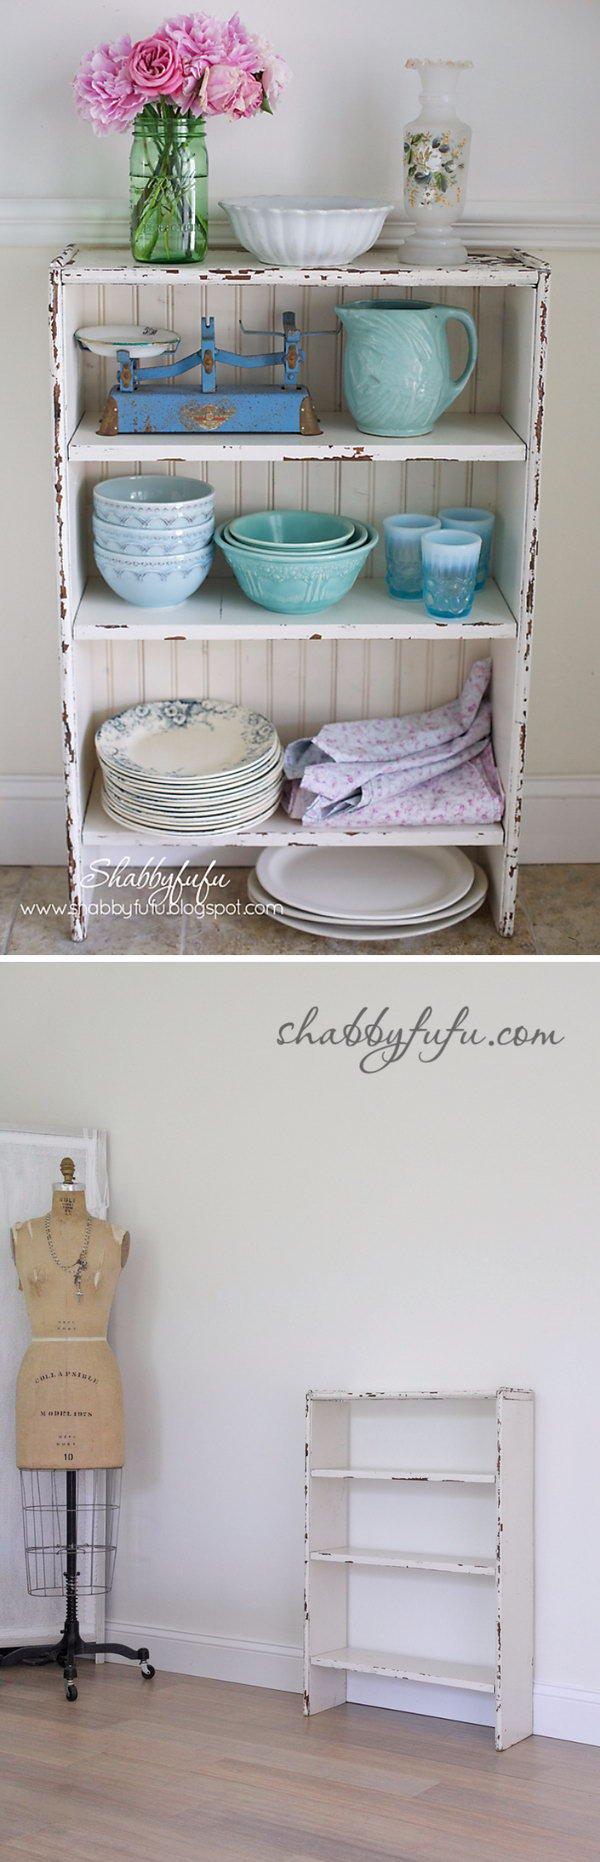 39-diy-shabby-chic-furniture-ideas-tutorials